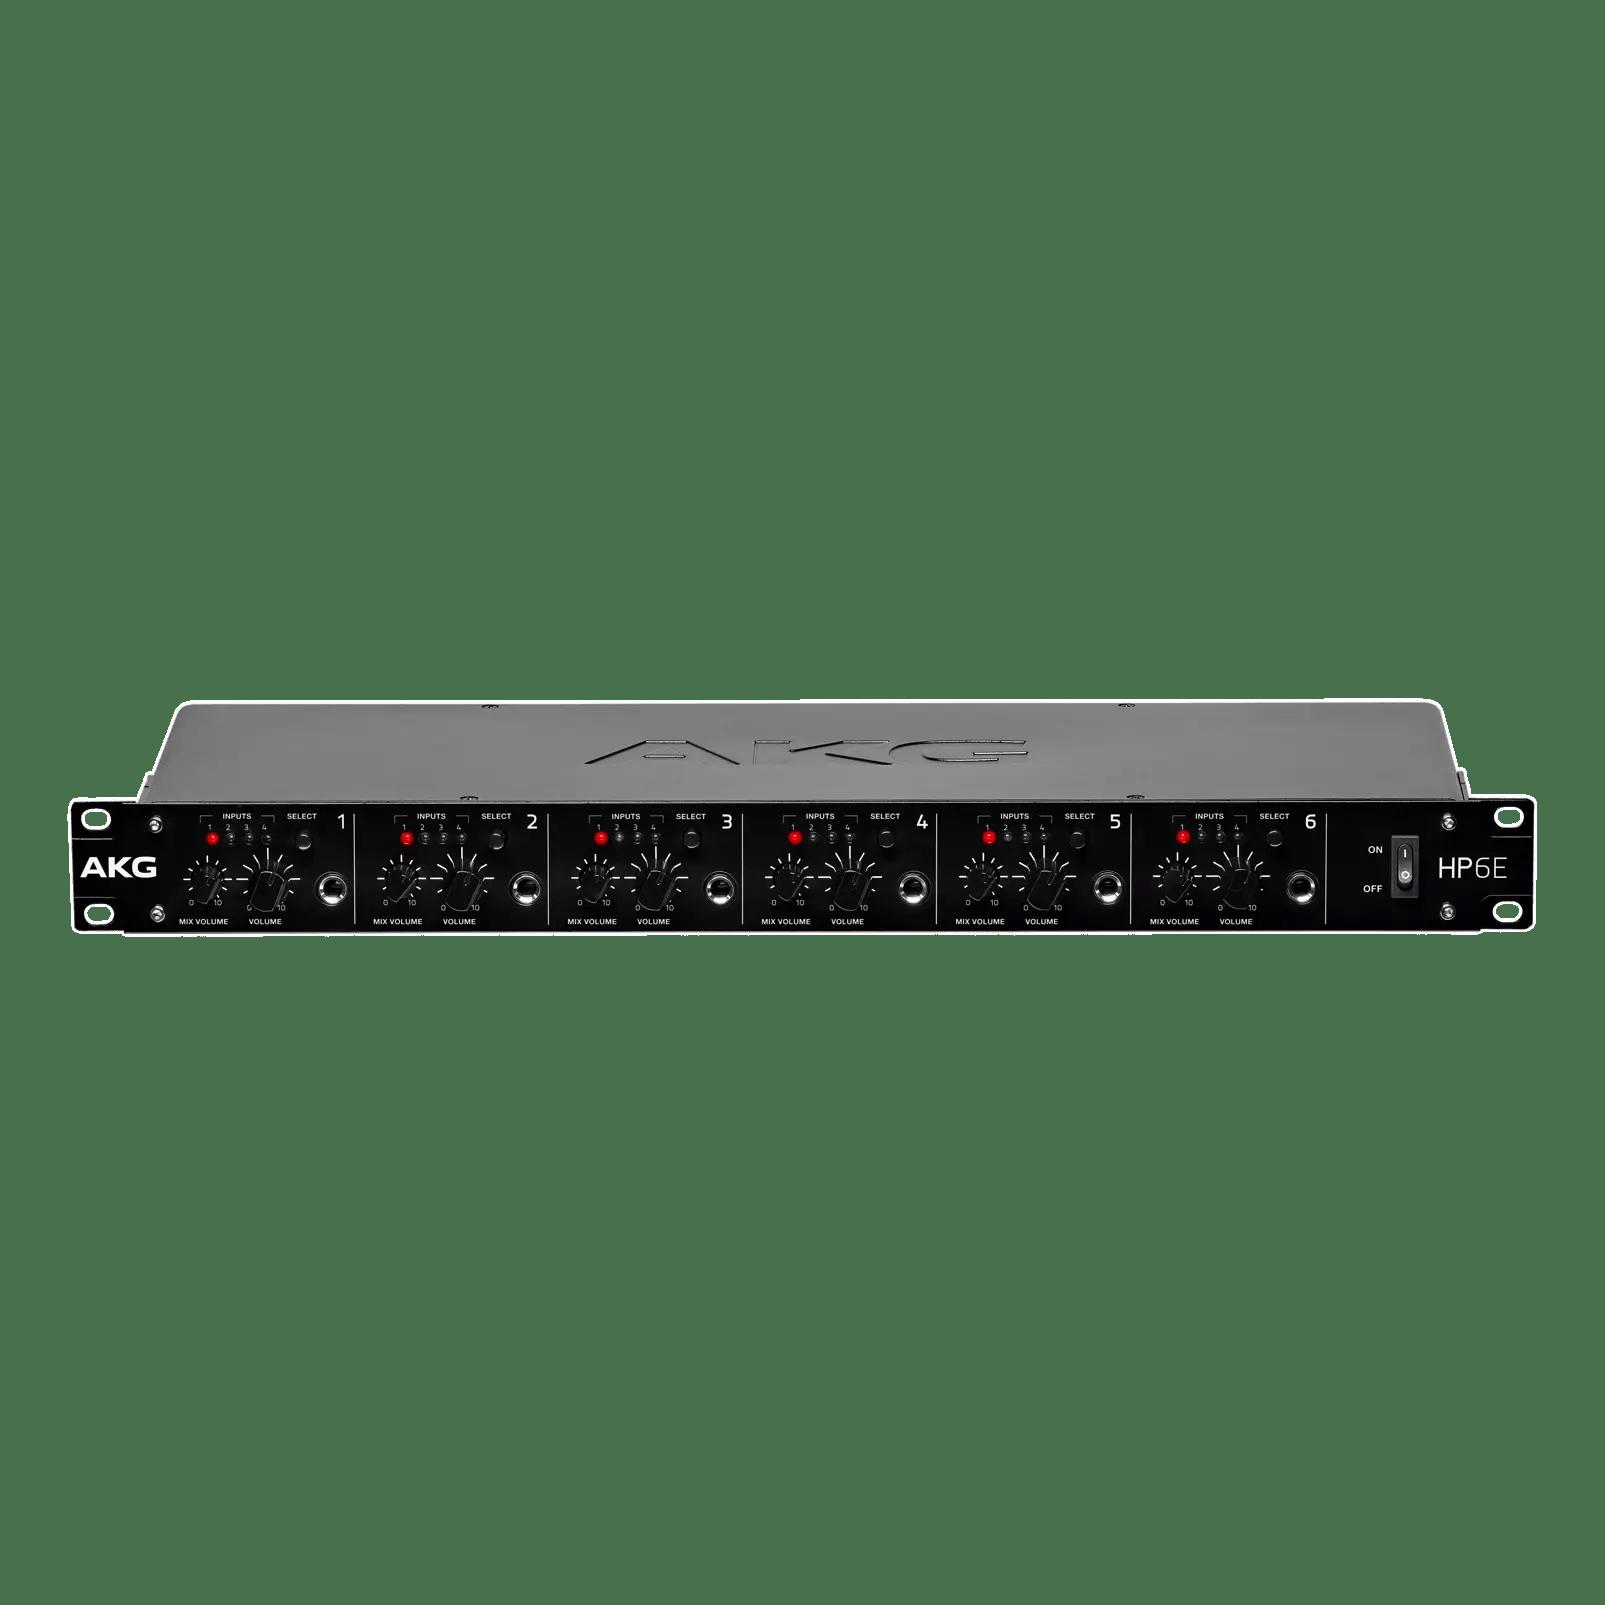 medium resolution of hp6e 6 channel matrix headphone amplifier headphone amp v10 schematic